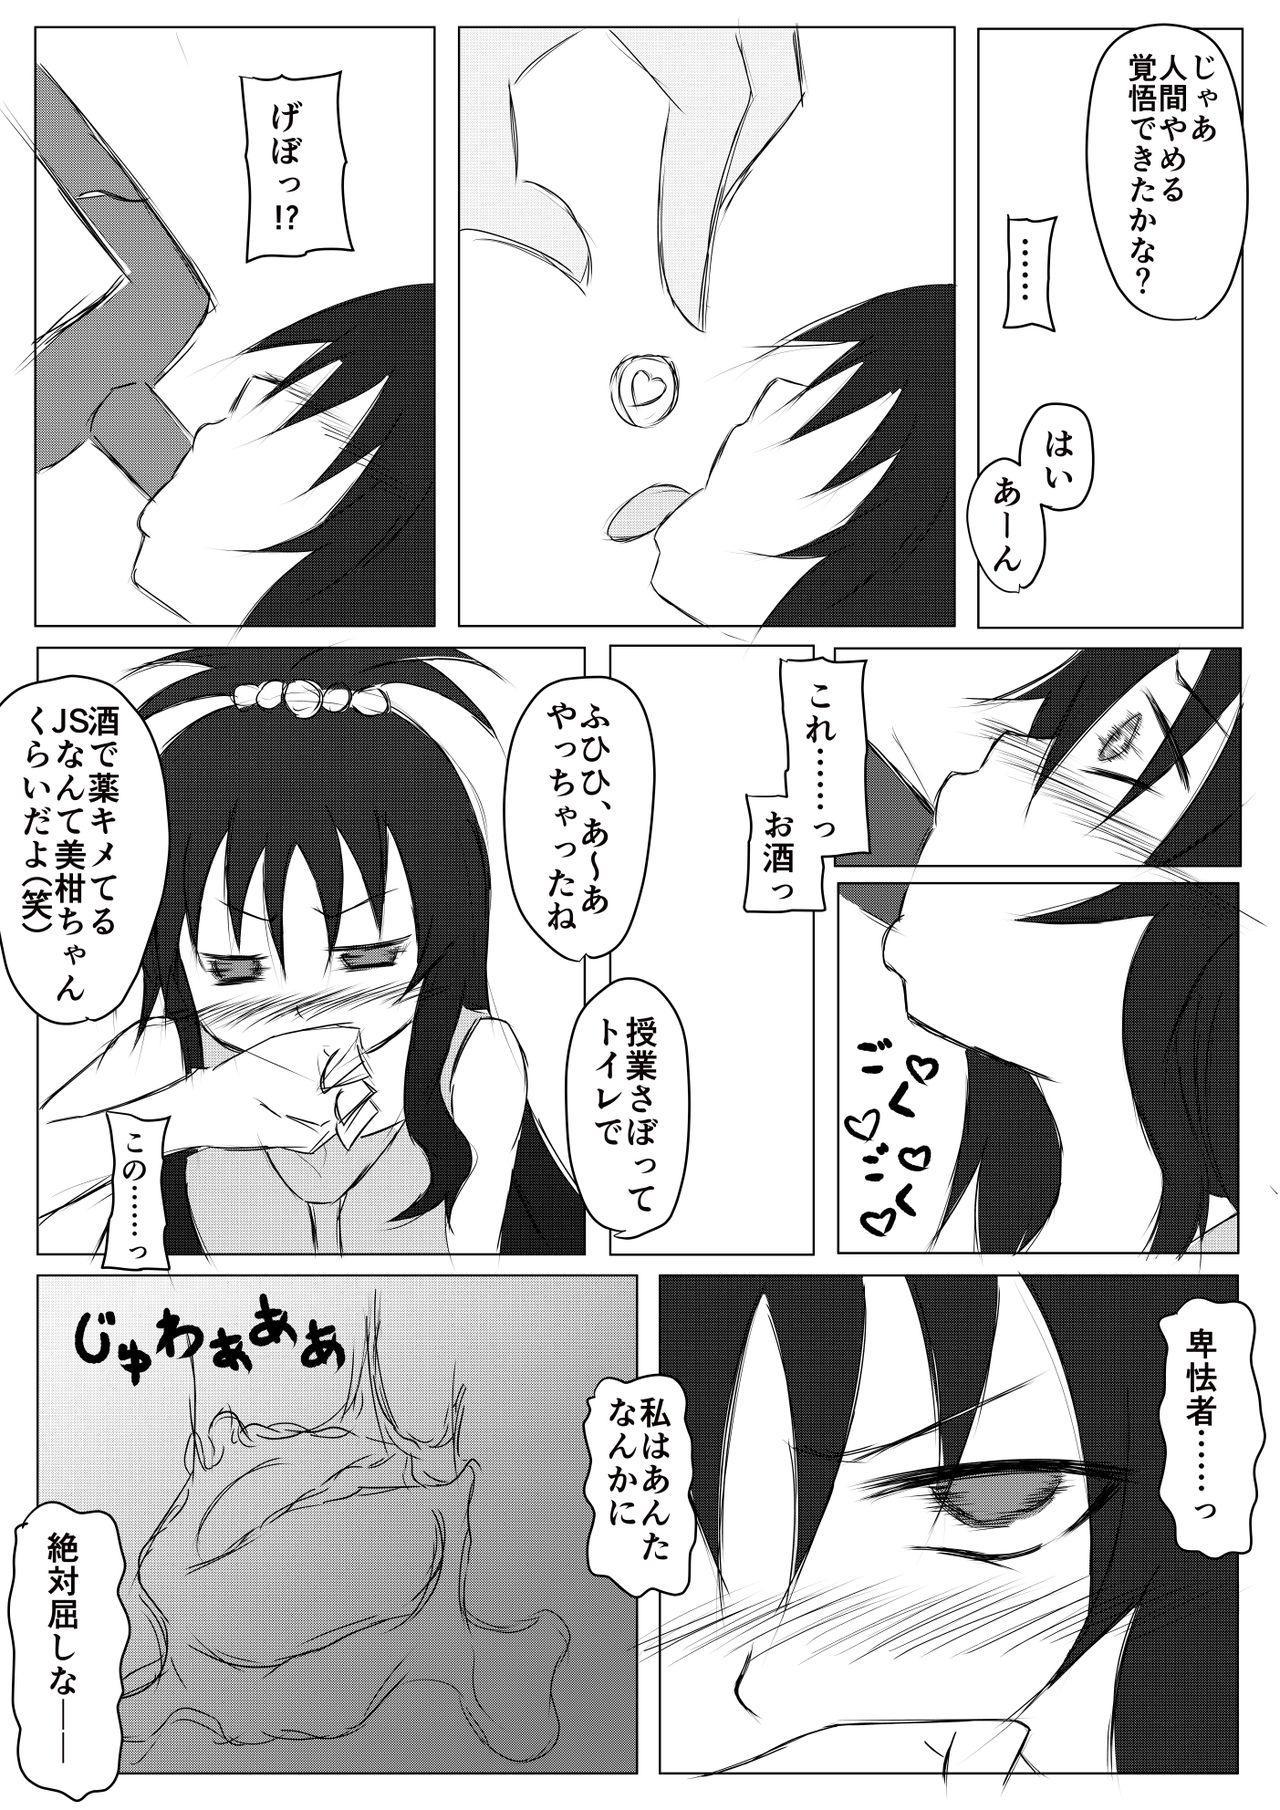 Mikan-chan Igai Sennouzumi 4